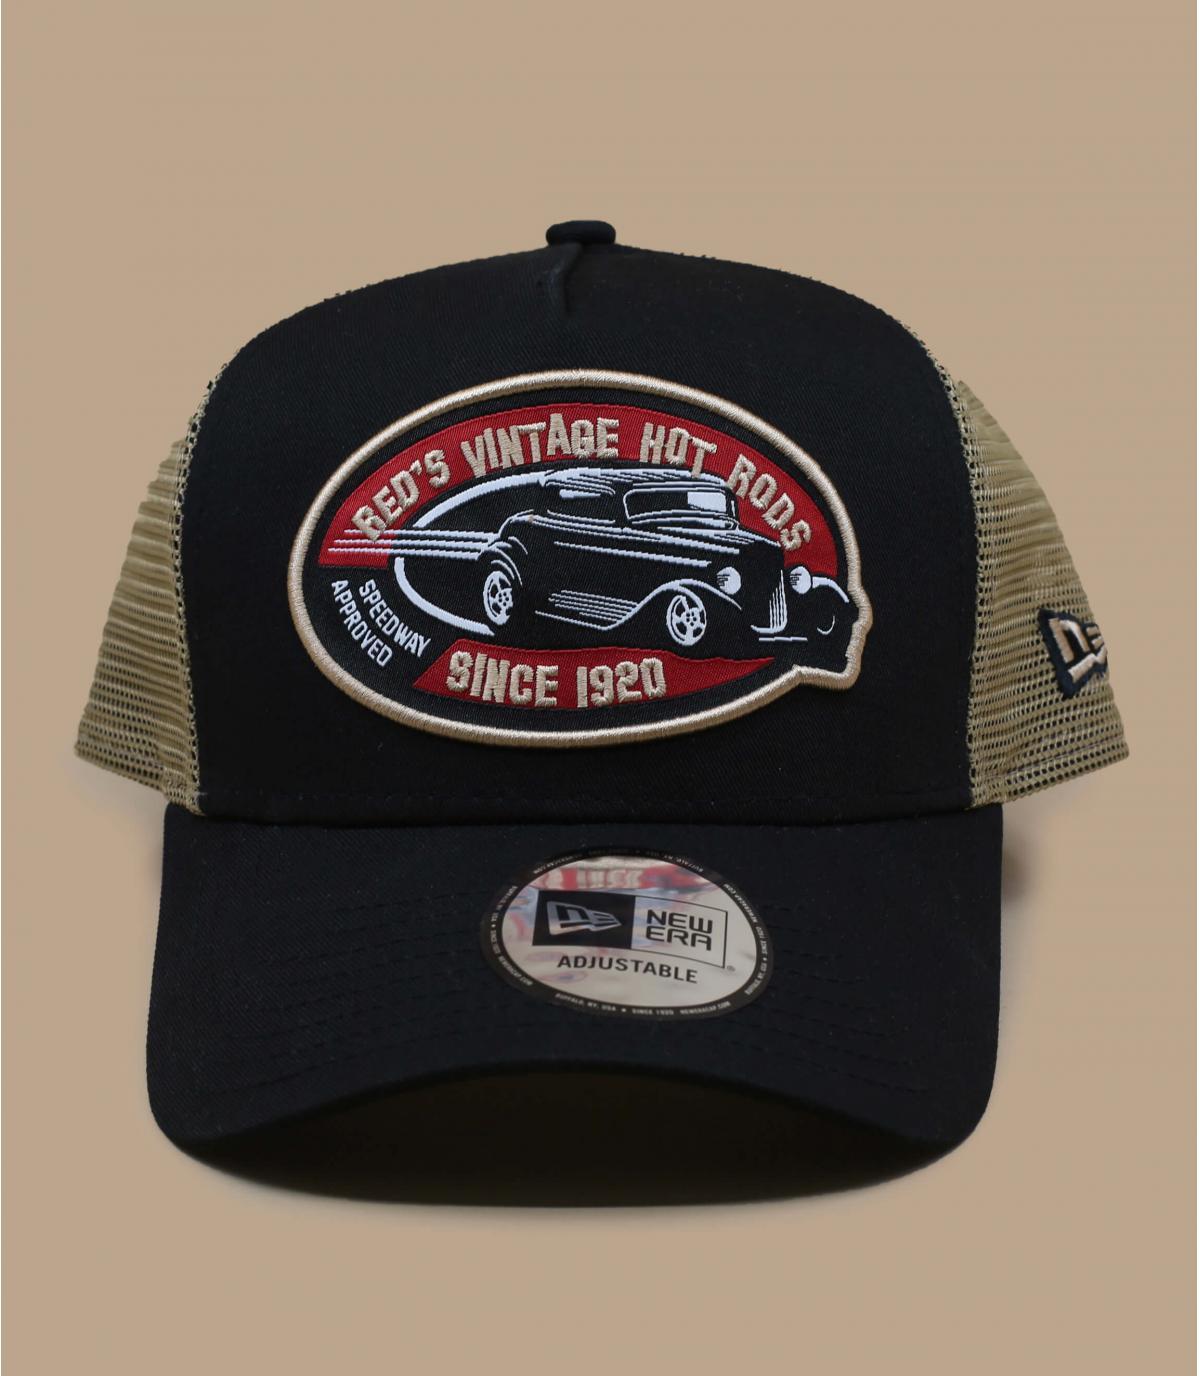 Details Trucker Cap Hot Rod black - Abbildung 2